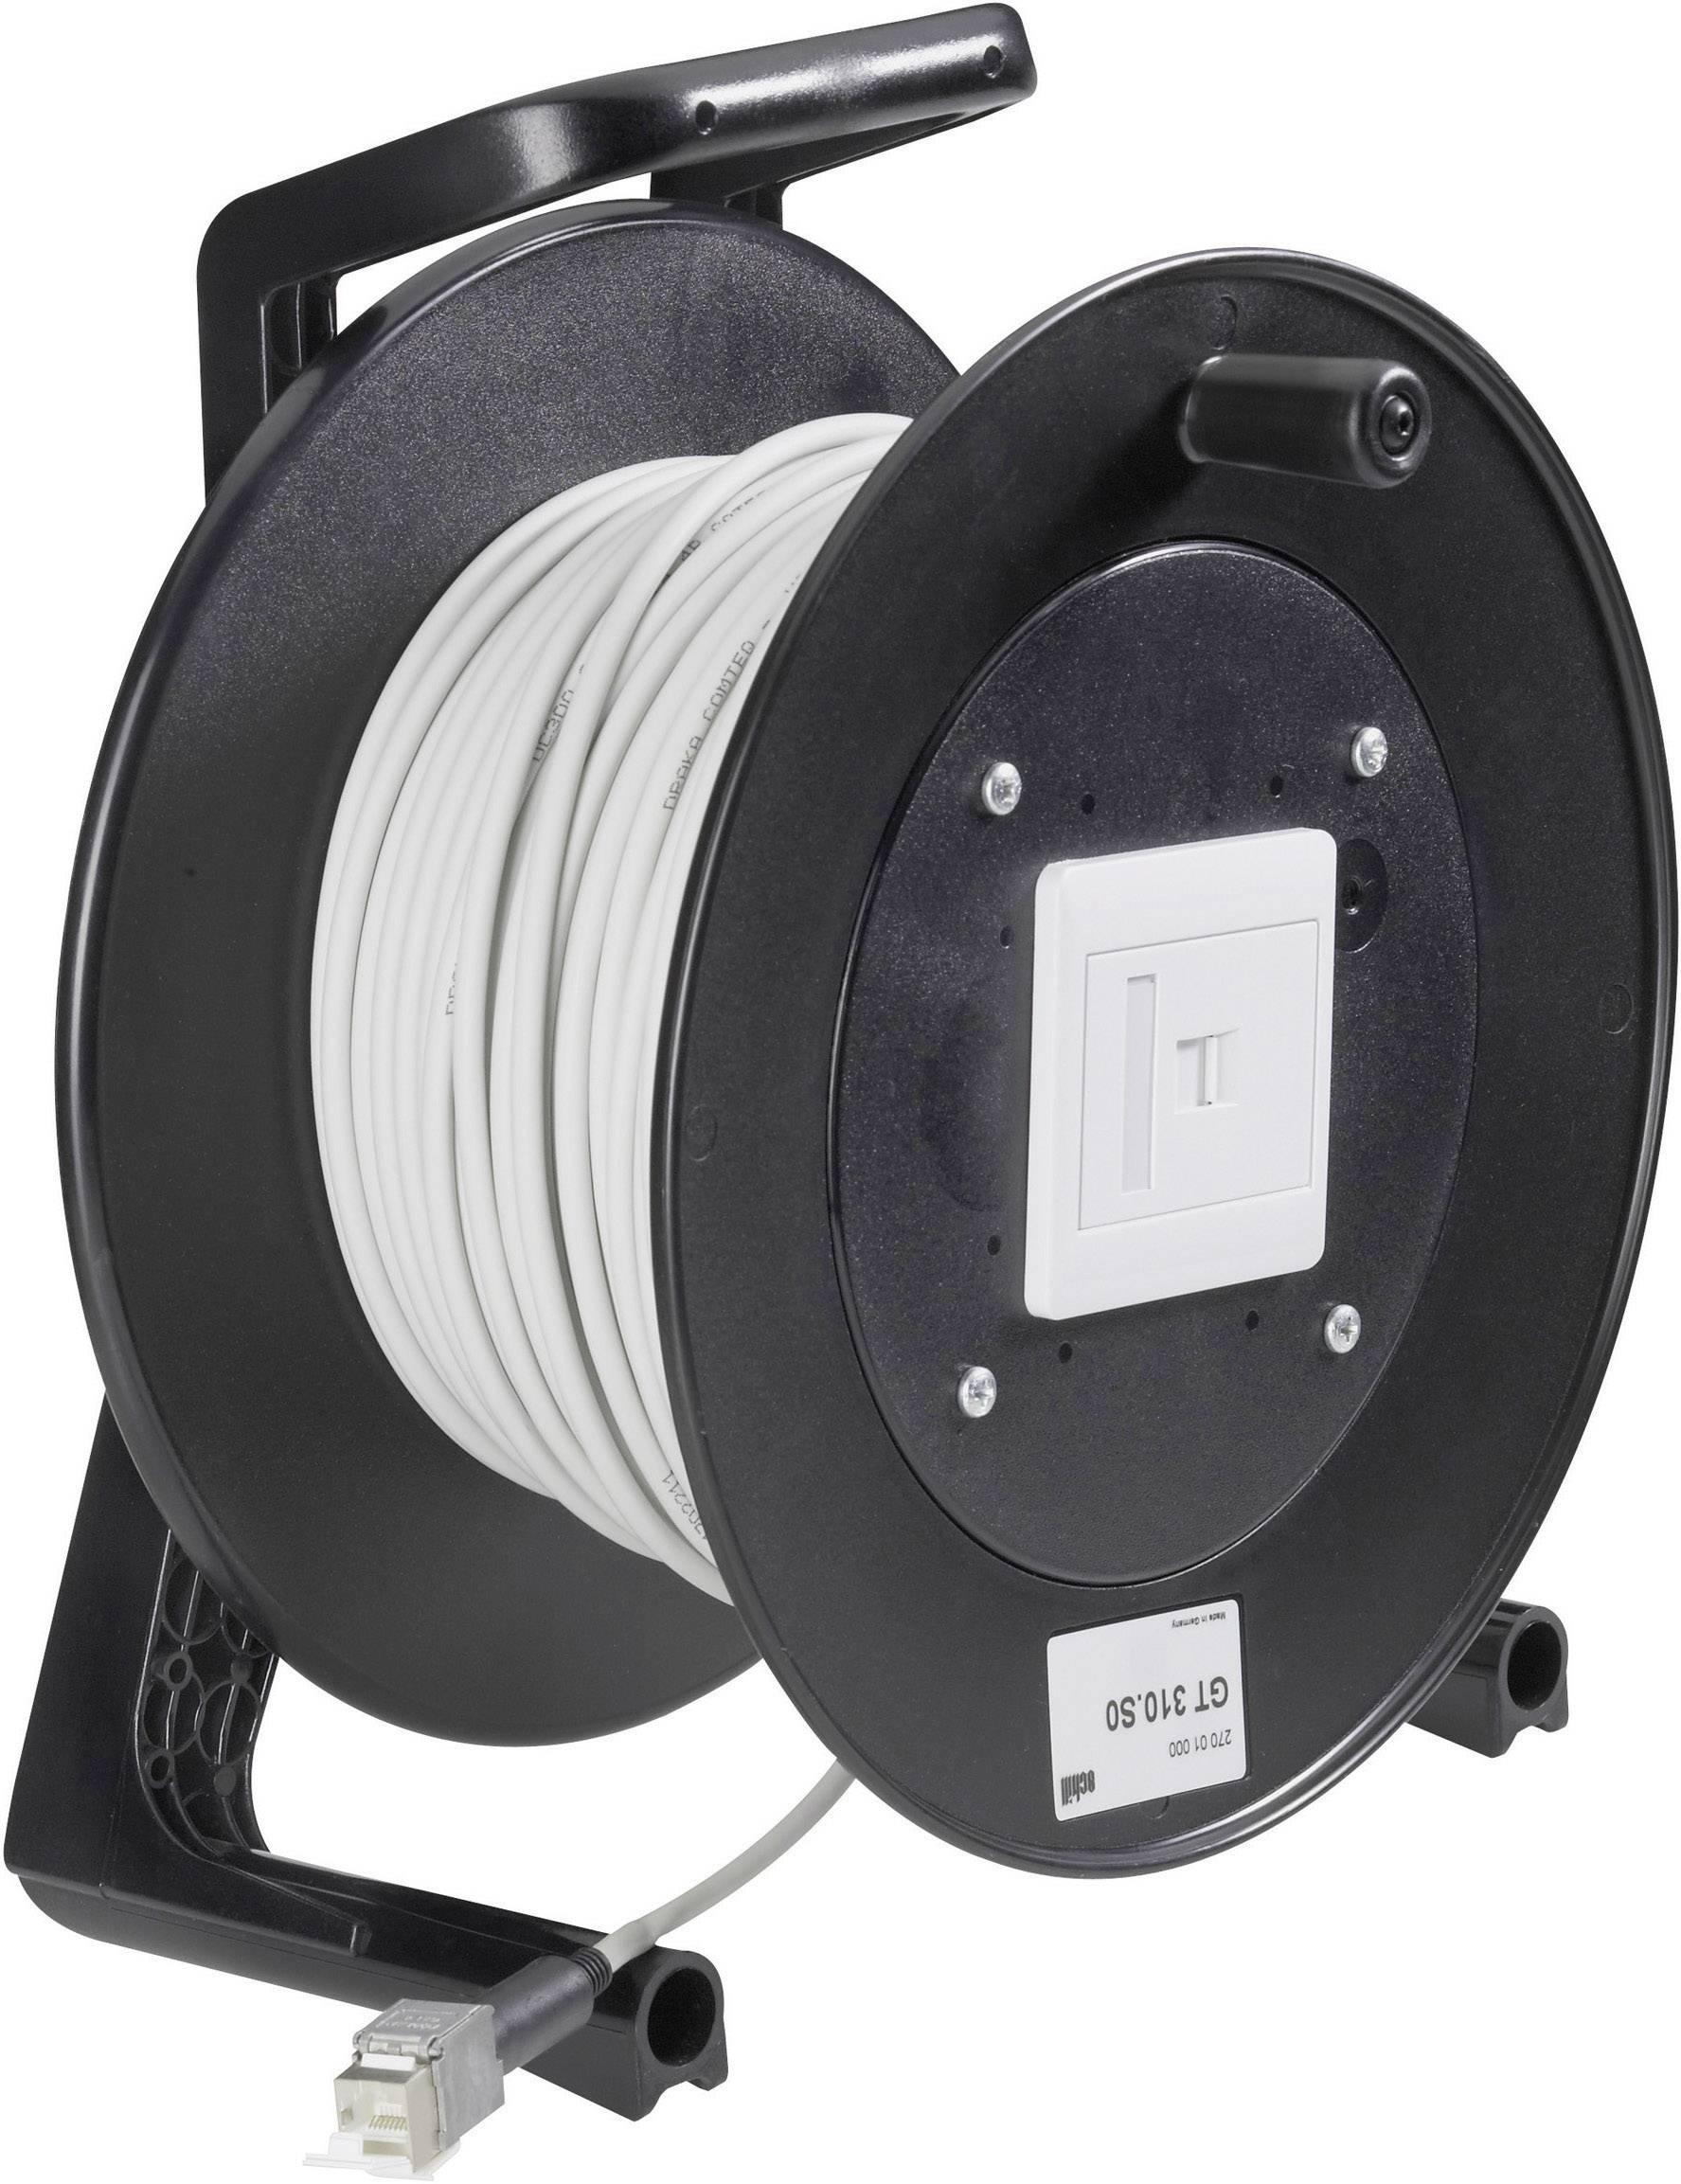 Sieťové (ethernetové) UTP káble na káblovom bubne